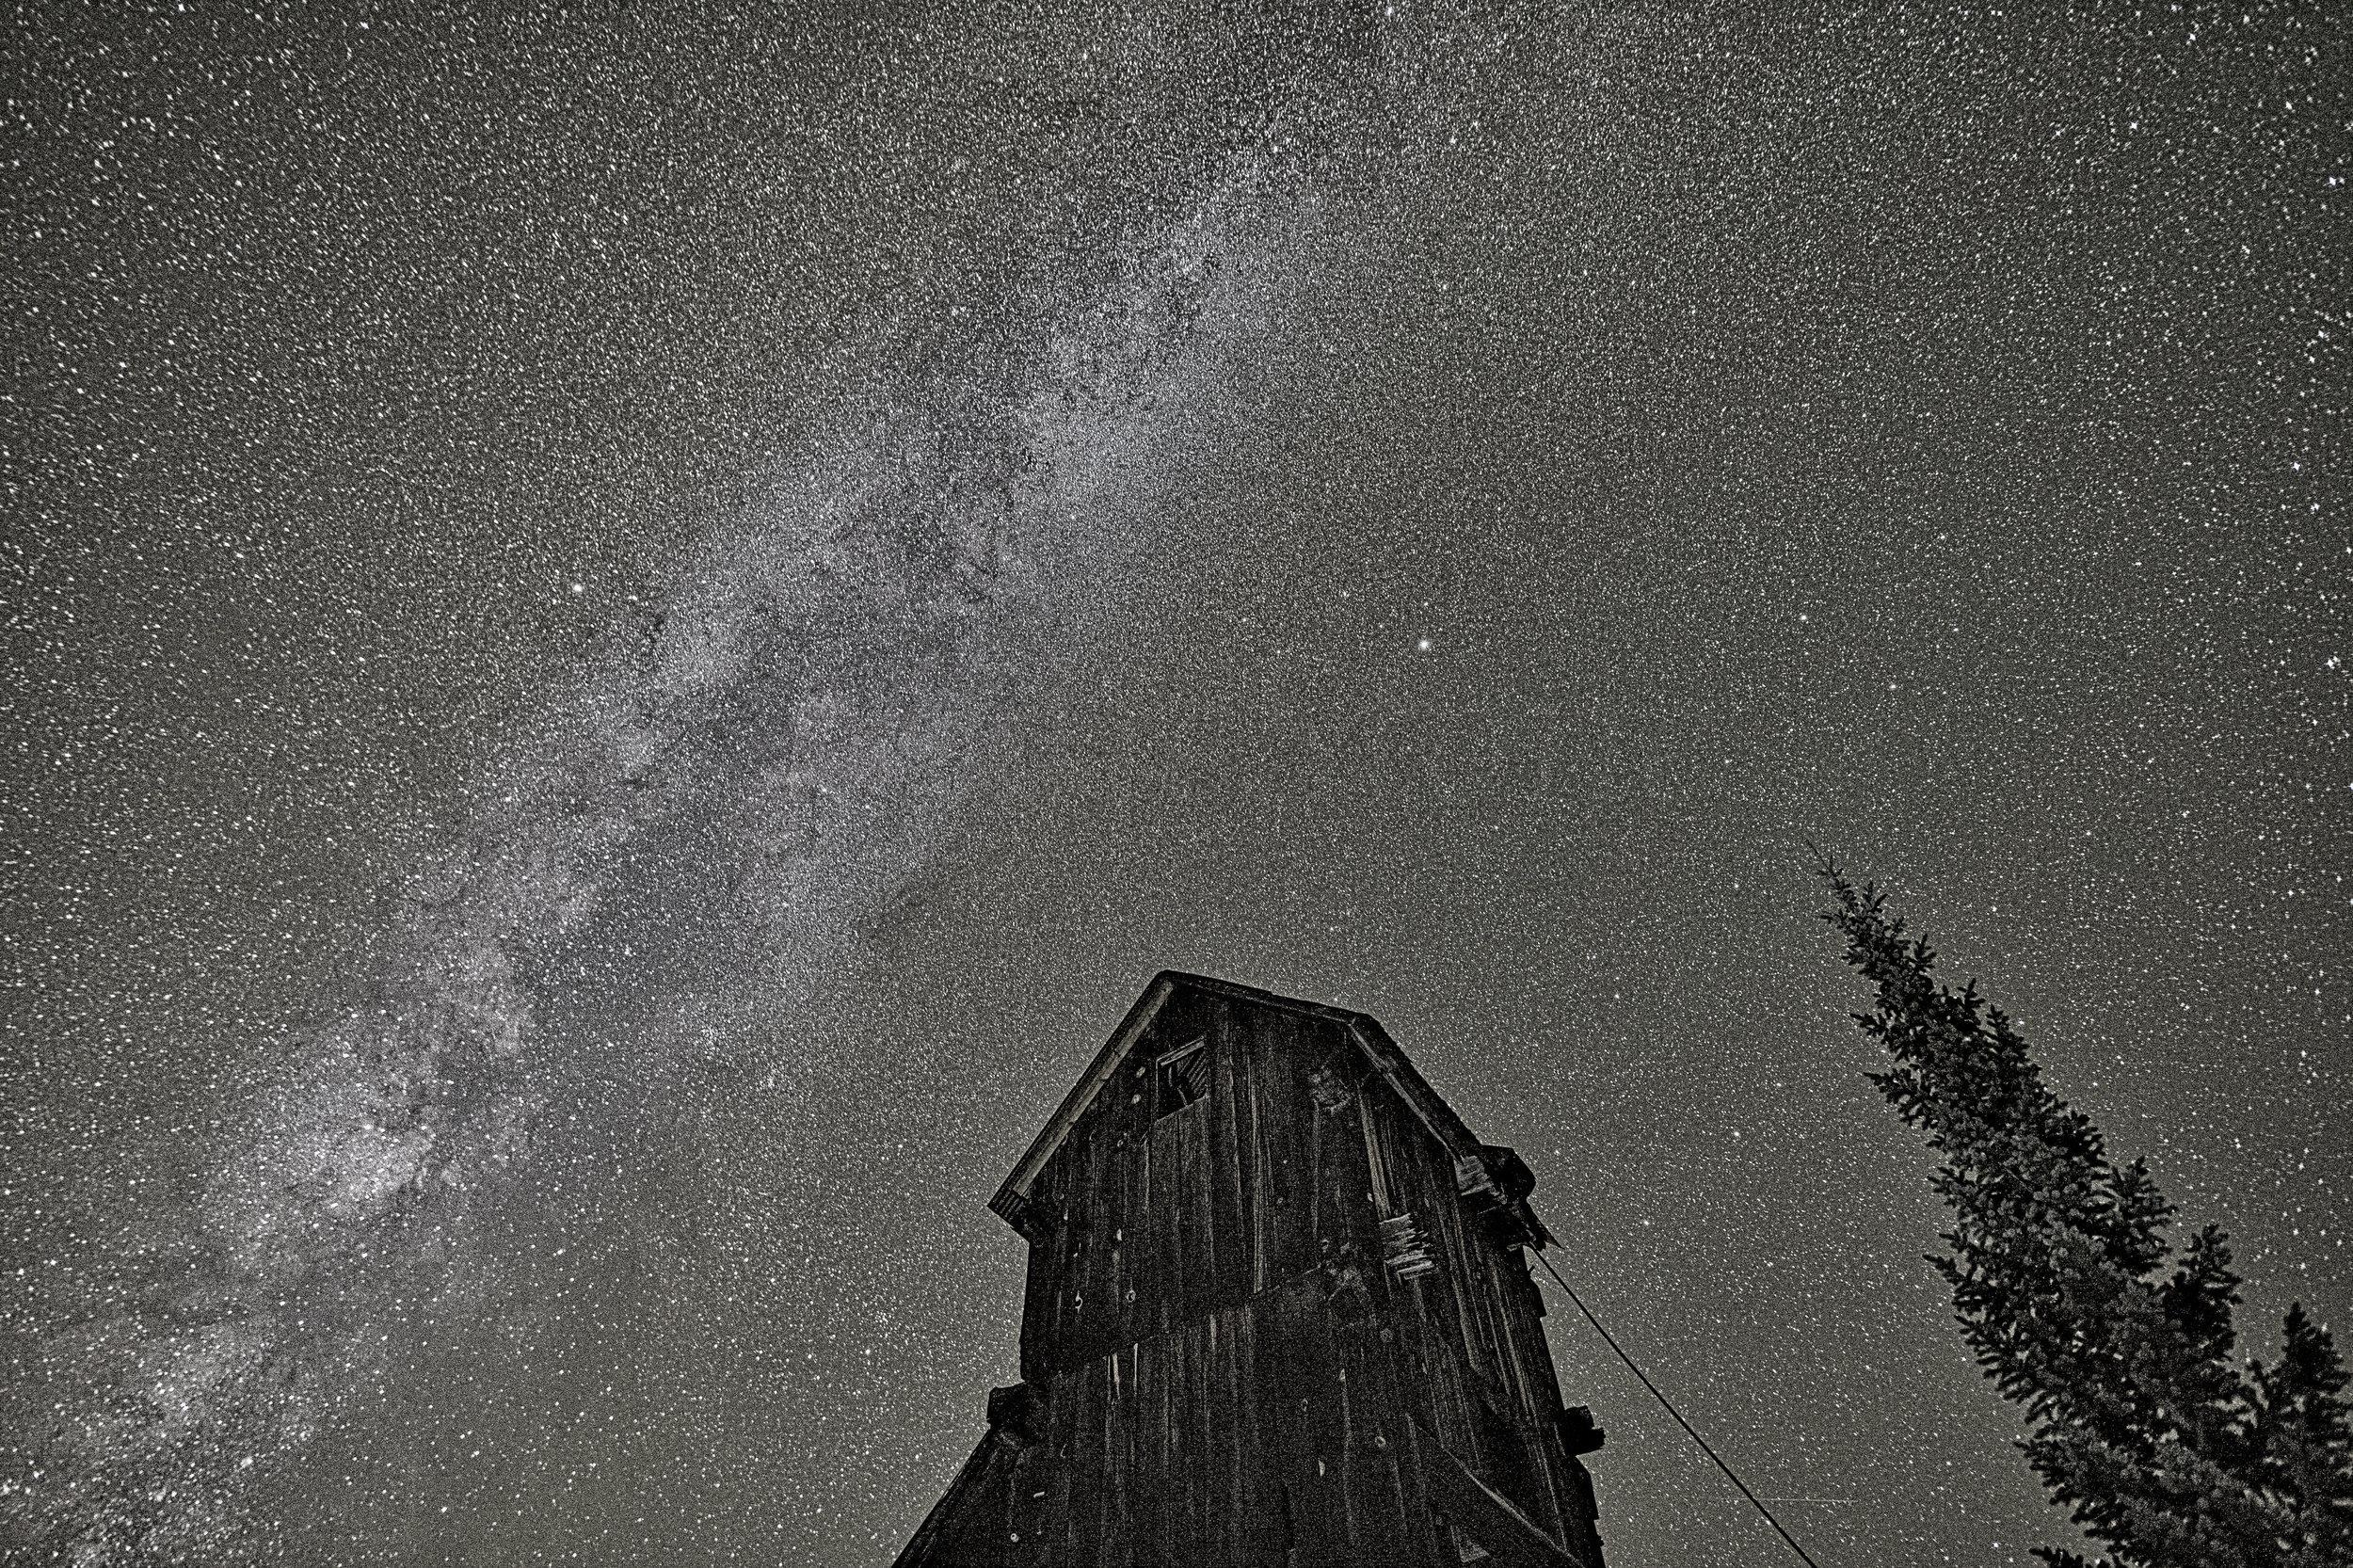 Milky way over Yankee Girl Mine, Image # 5556